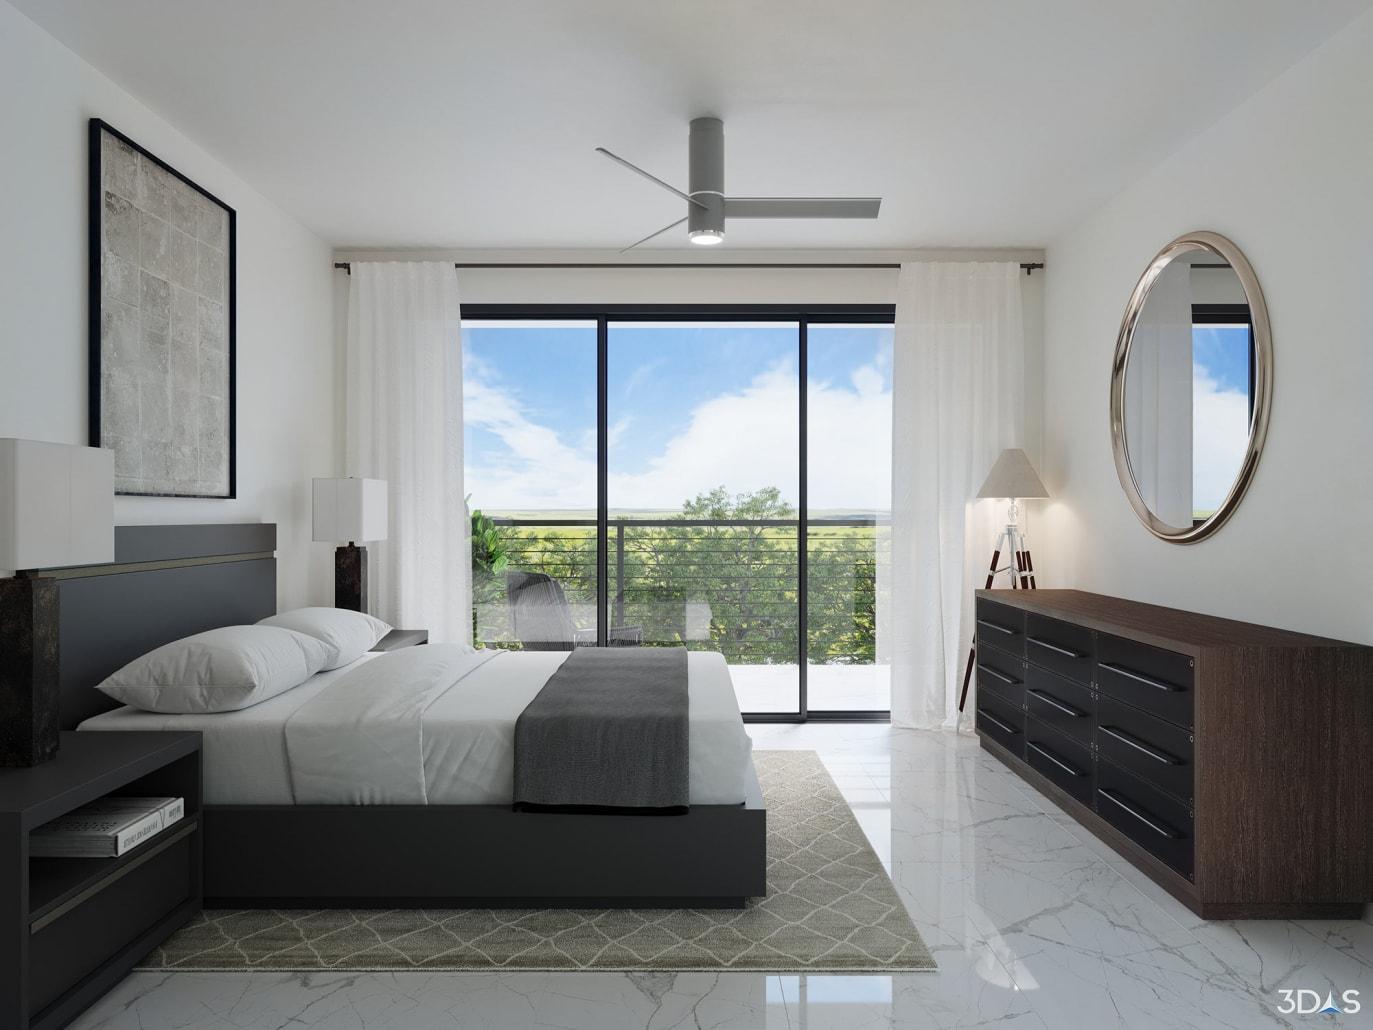 Located at 5247 Desoto Road in Sarasota, Florida. Bedroom 3D rendering is for Grande Oaks Preserve townhomes.